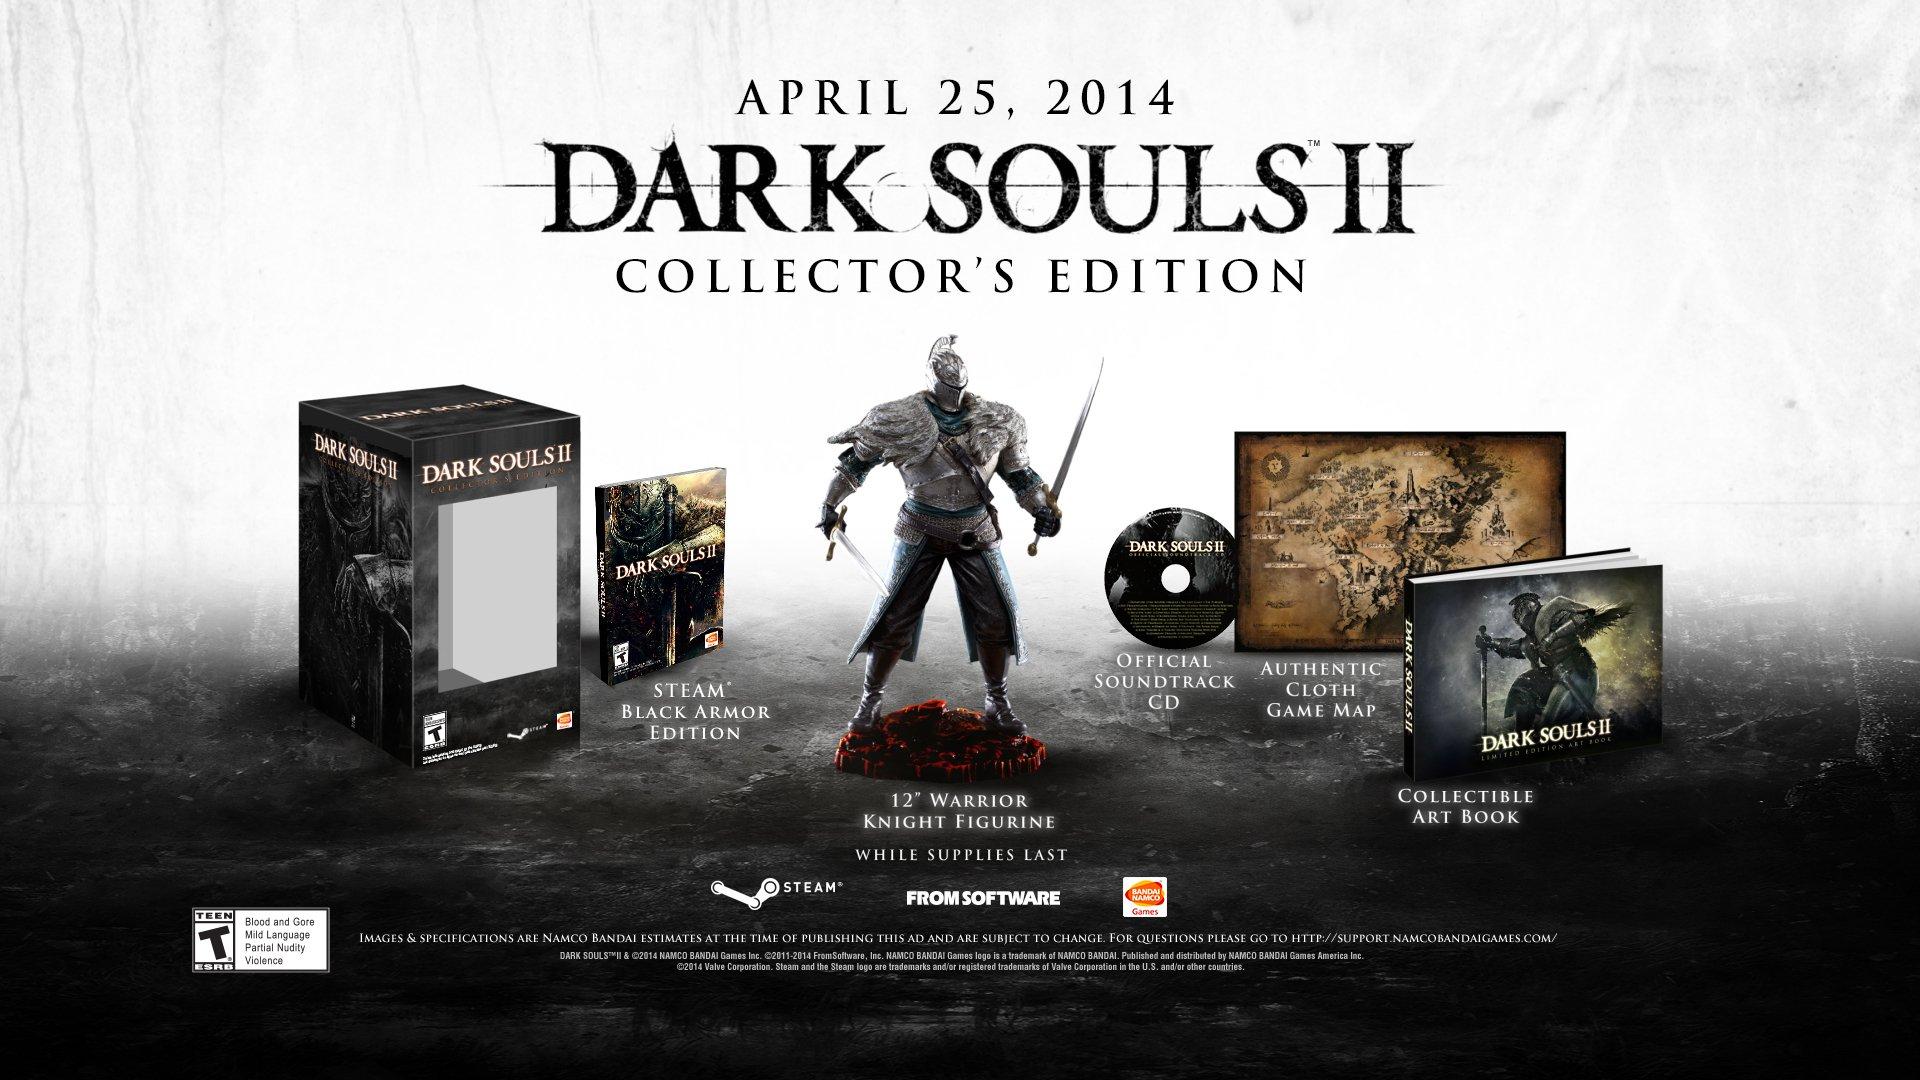 Dark souls 2 ps4 release date